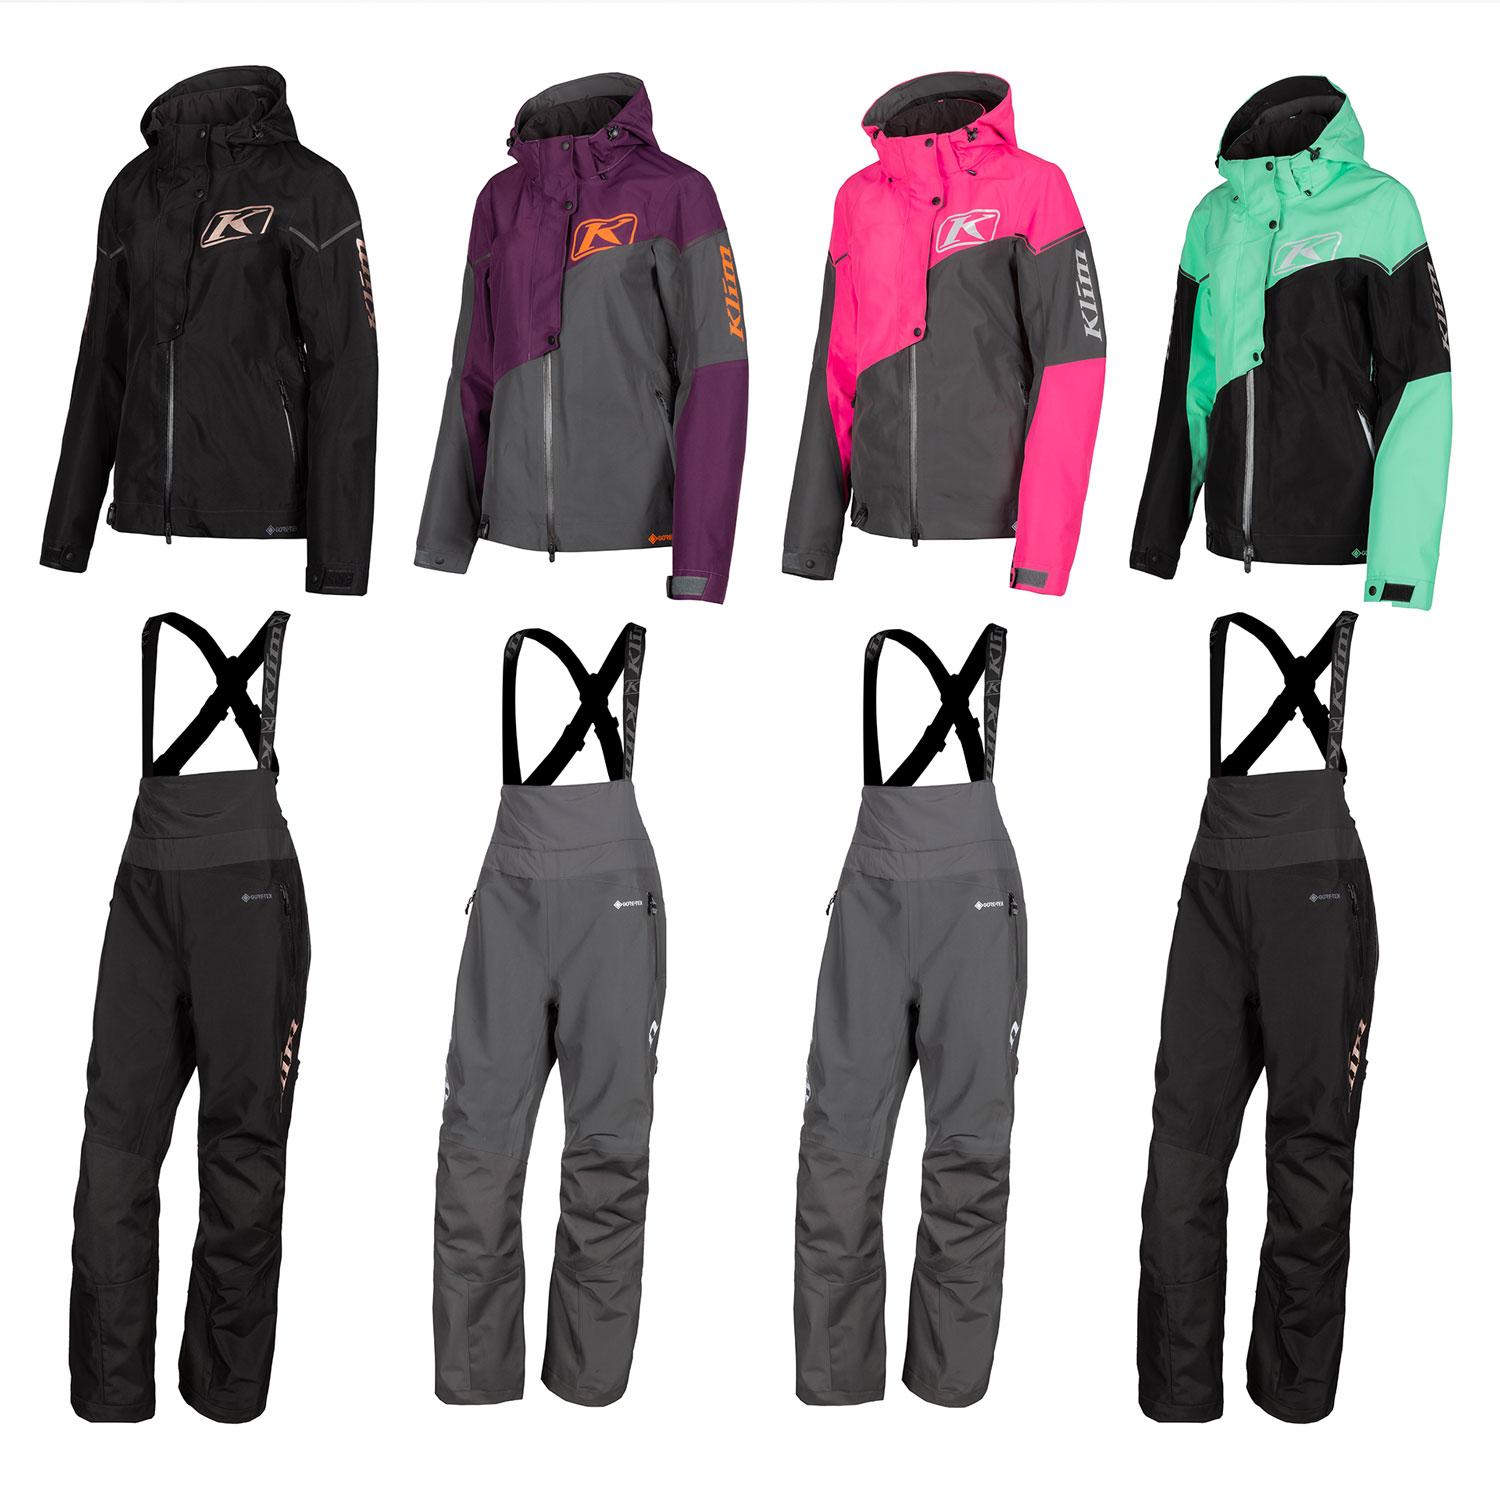 Alpine Jacket and Bib4